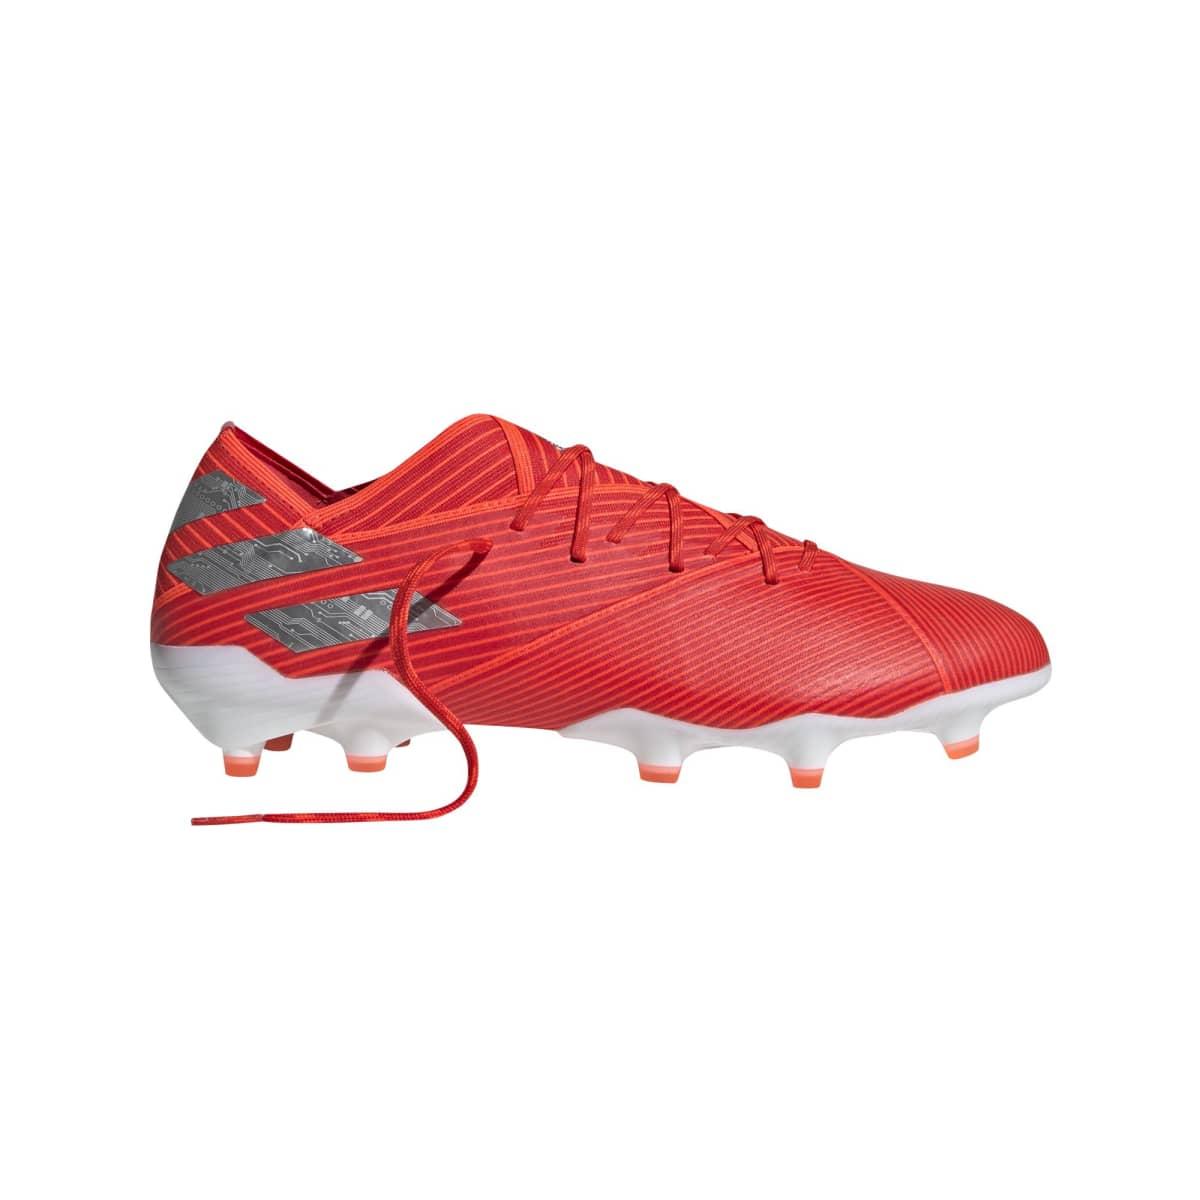 827c53da4101 Men   Soccer Boots   Sportsmans Warehouse